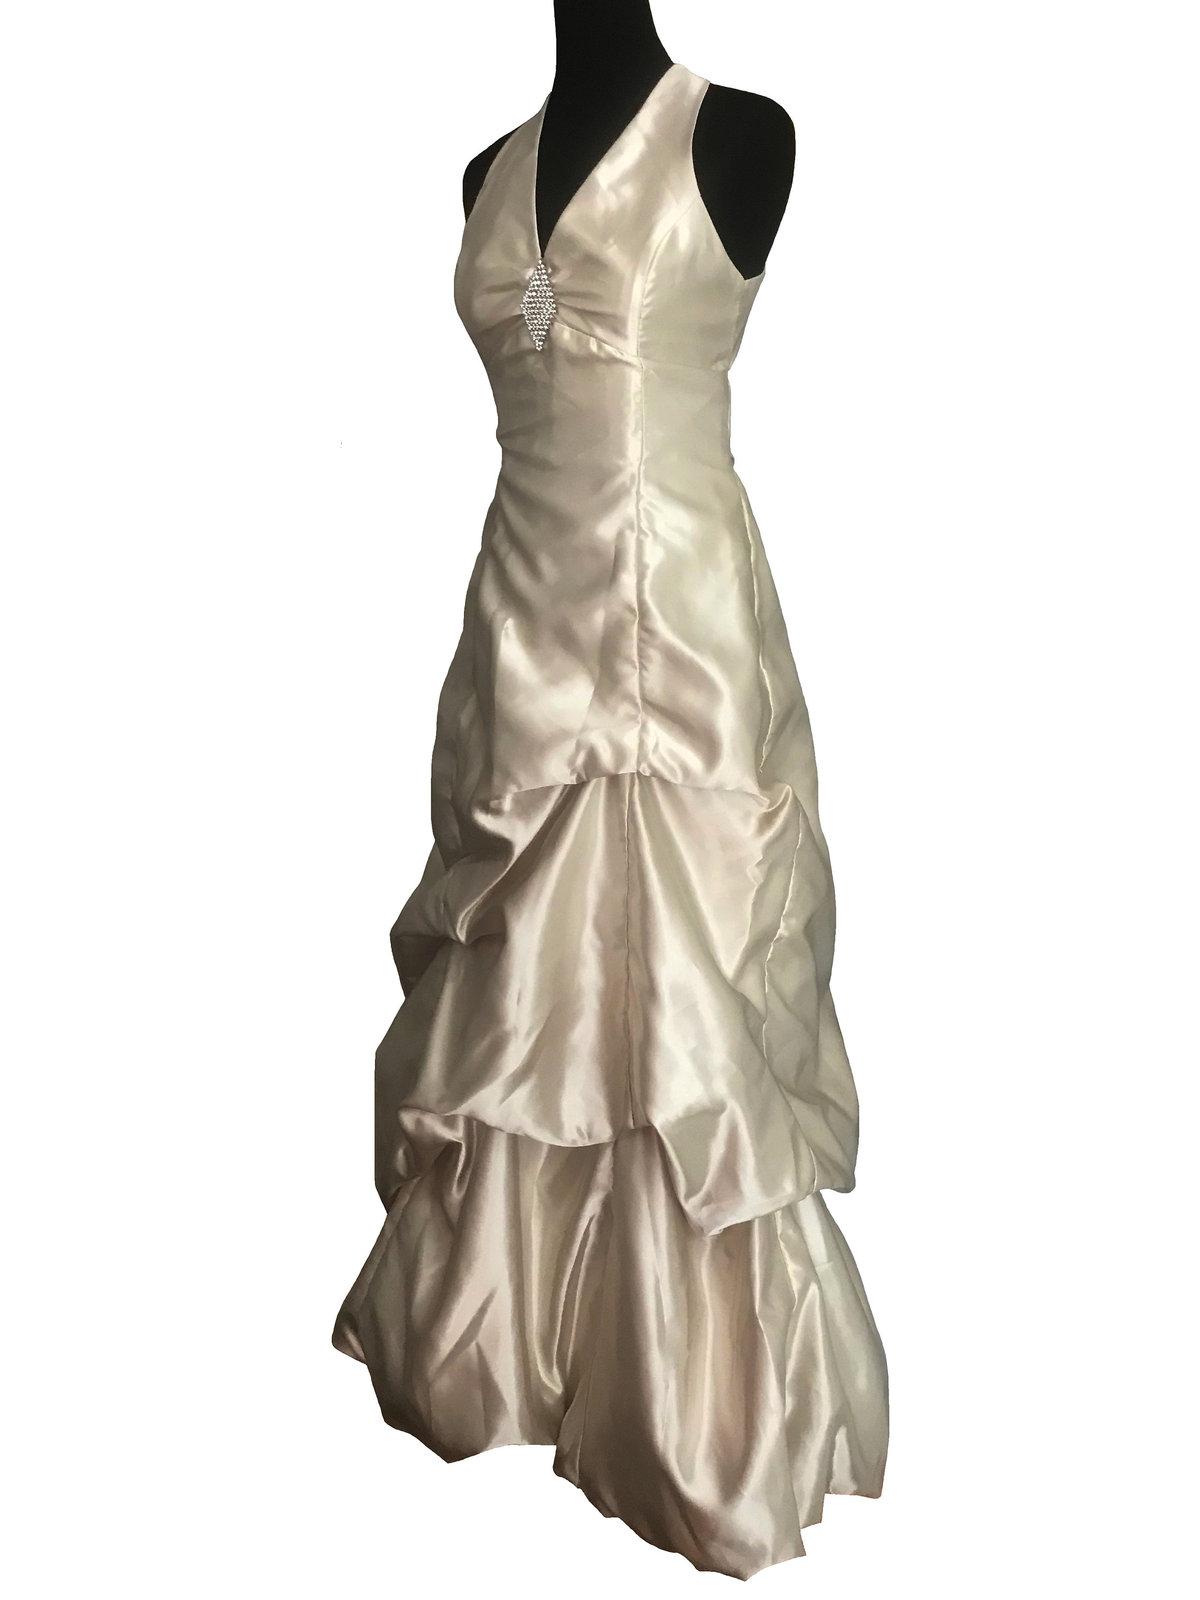 80s Jessica McClintock Gunne Sax Ivory Satin Rhinestone Pin Halter Low Back Gown